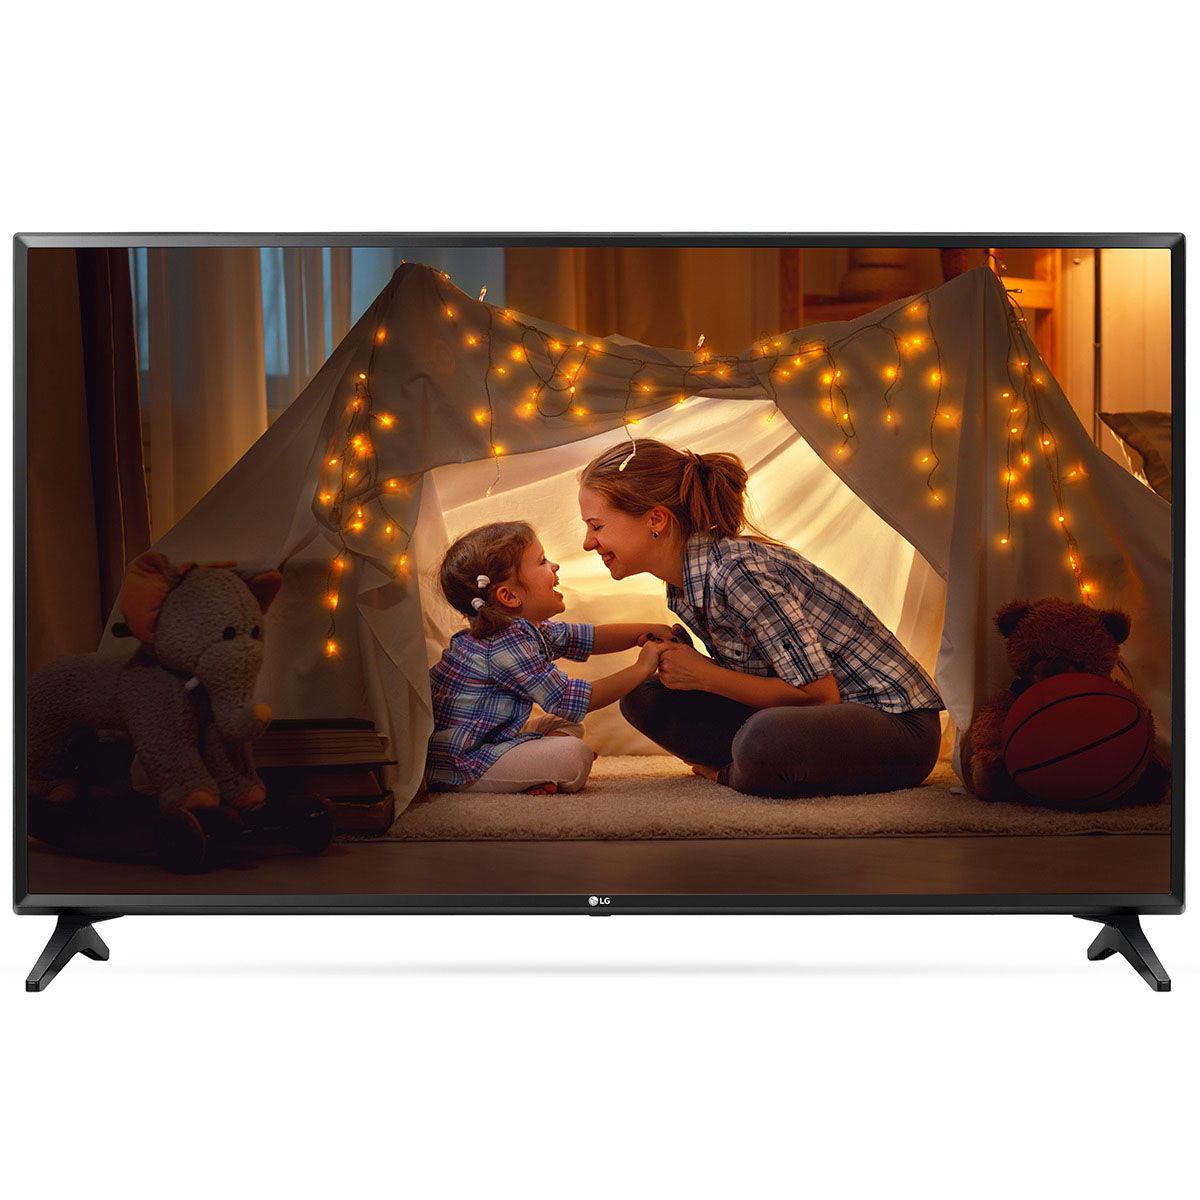 "Chedraui: Smart TV LG 43"" FullHD"